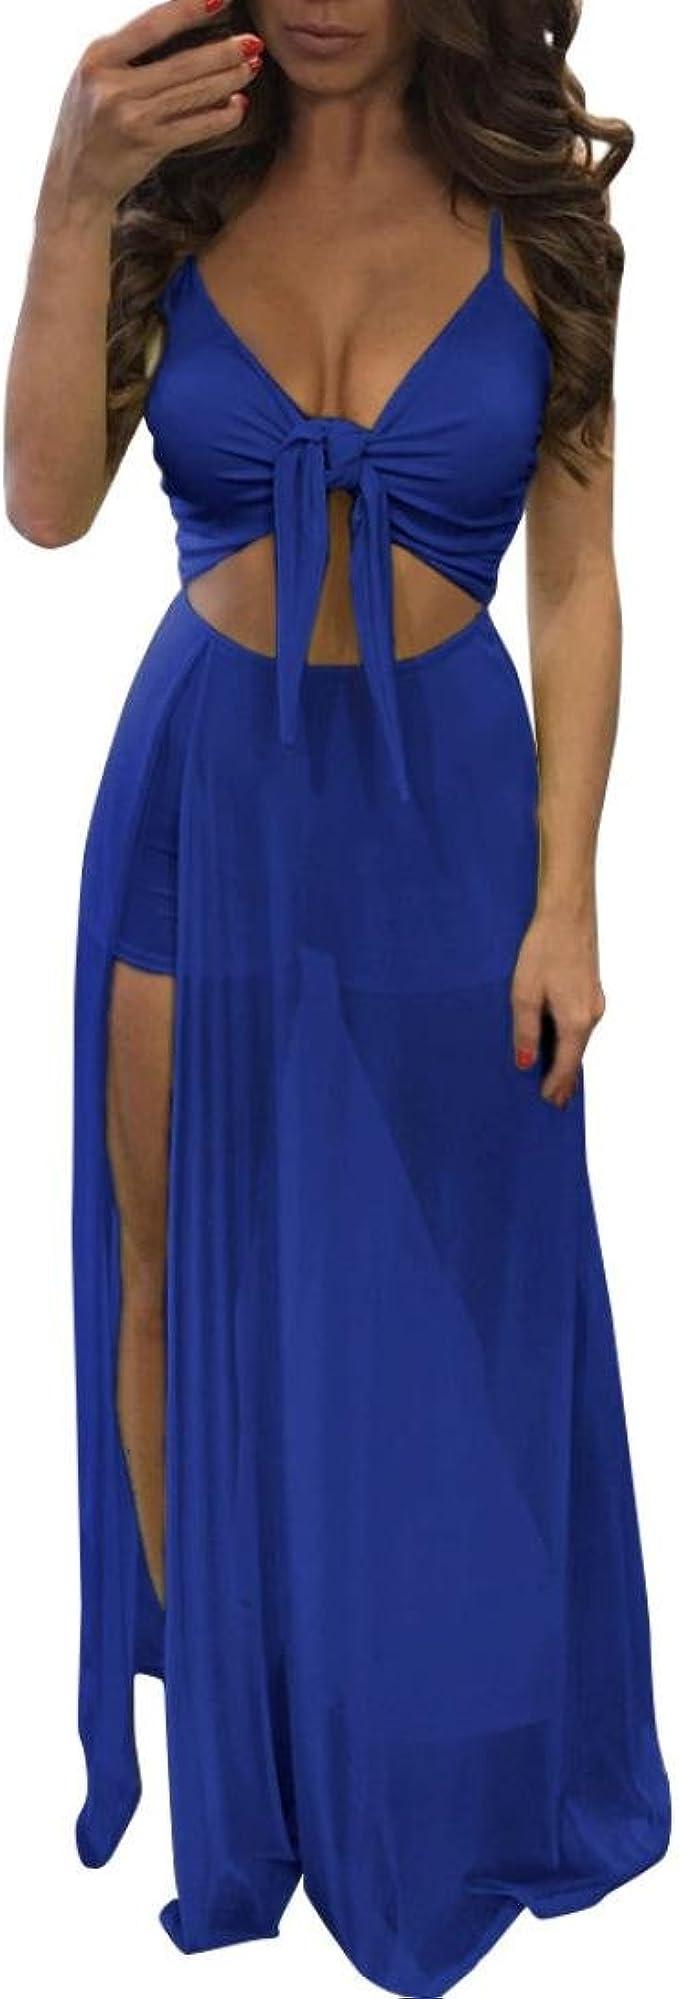 Youban Damen Sexy Kleid Jumpsuit Strampler Kurze Hose Kleid Bodycon Playsuit Langes Kleid Strandkleid Sexy Minikleid Sommerkleid Partykleid Gunstige Abendkleider S Blau Amazon De Bekleidung